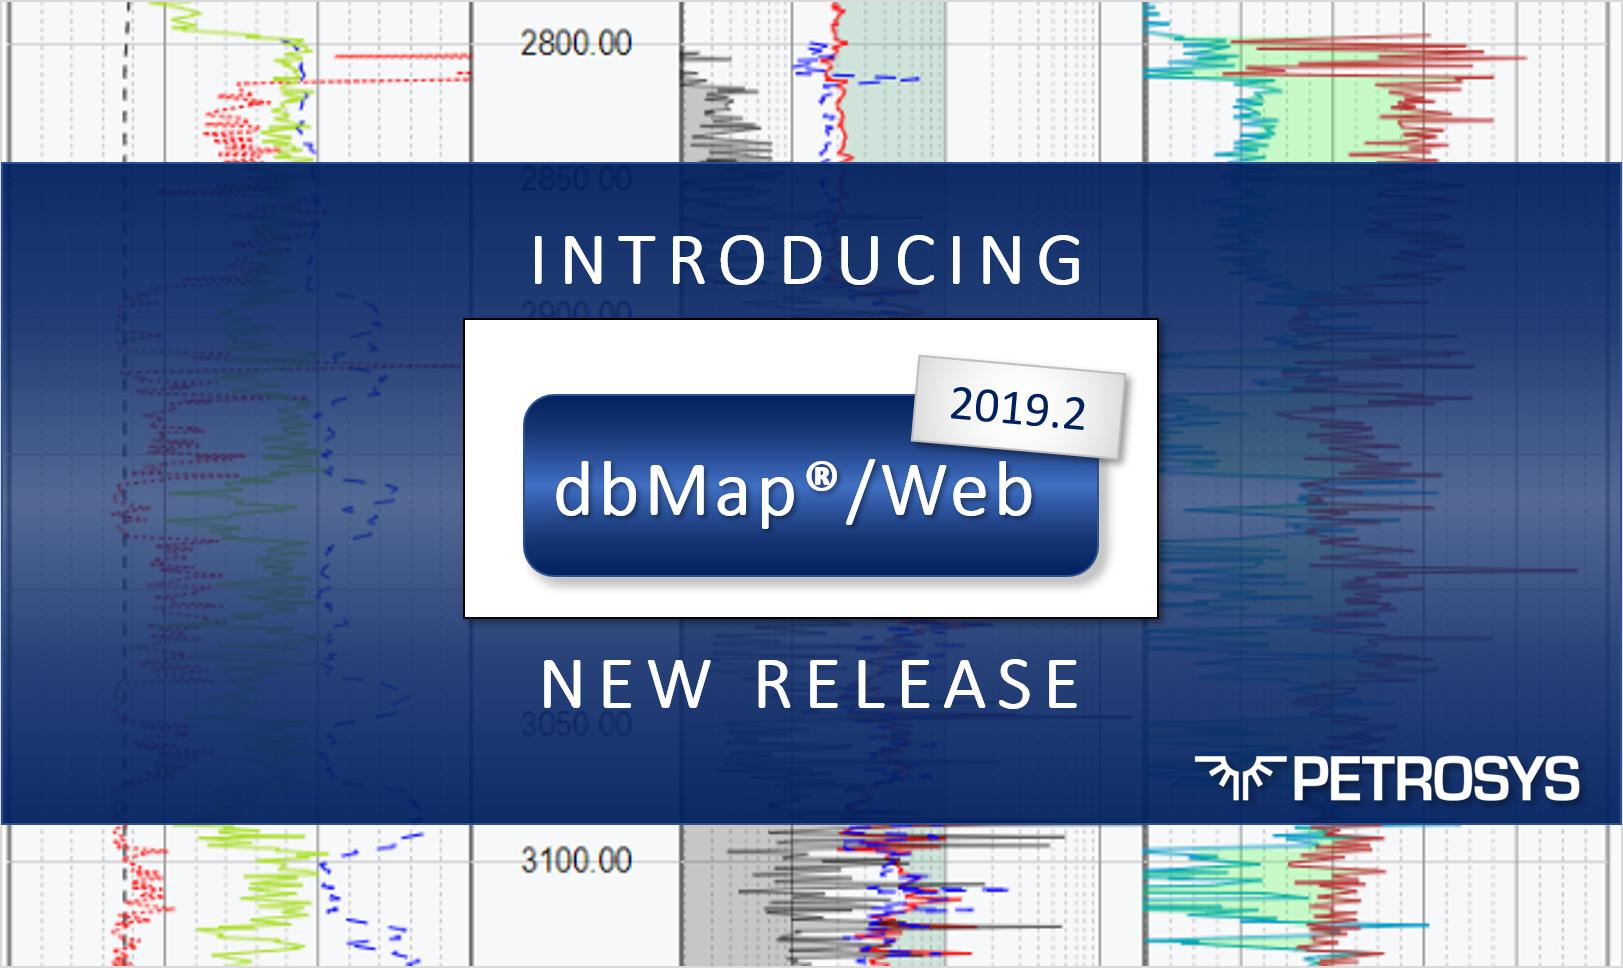 Introducing dbMap®/Web 2019.2